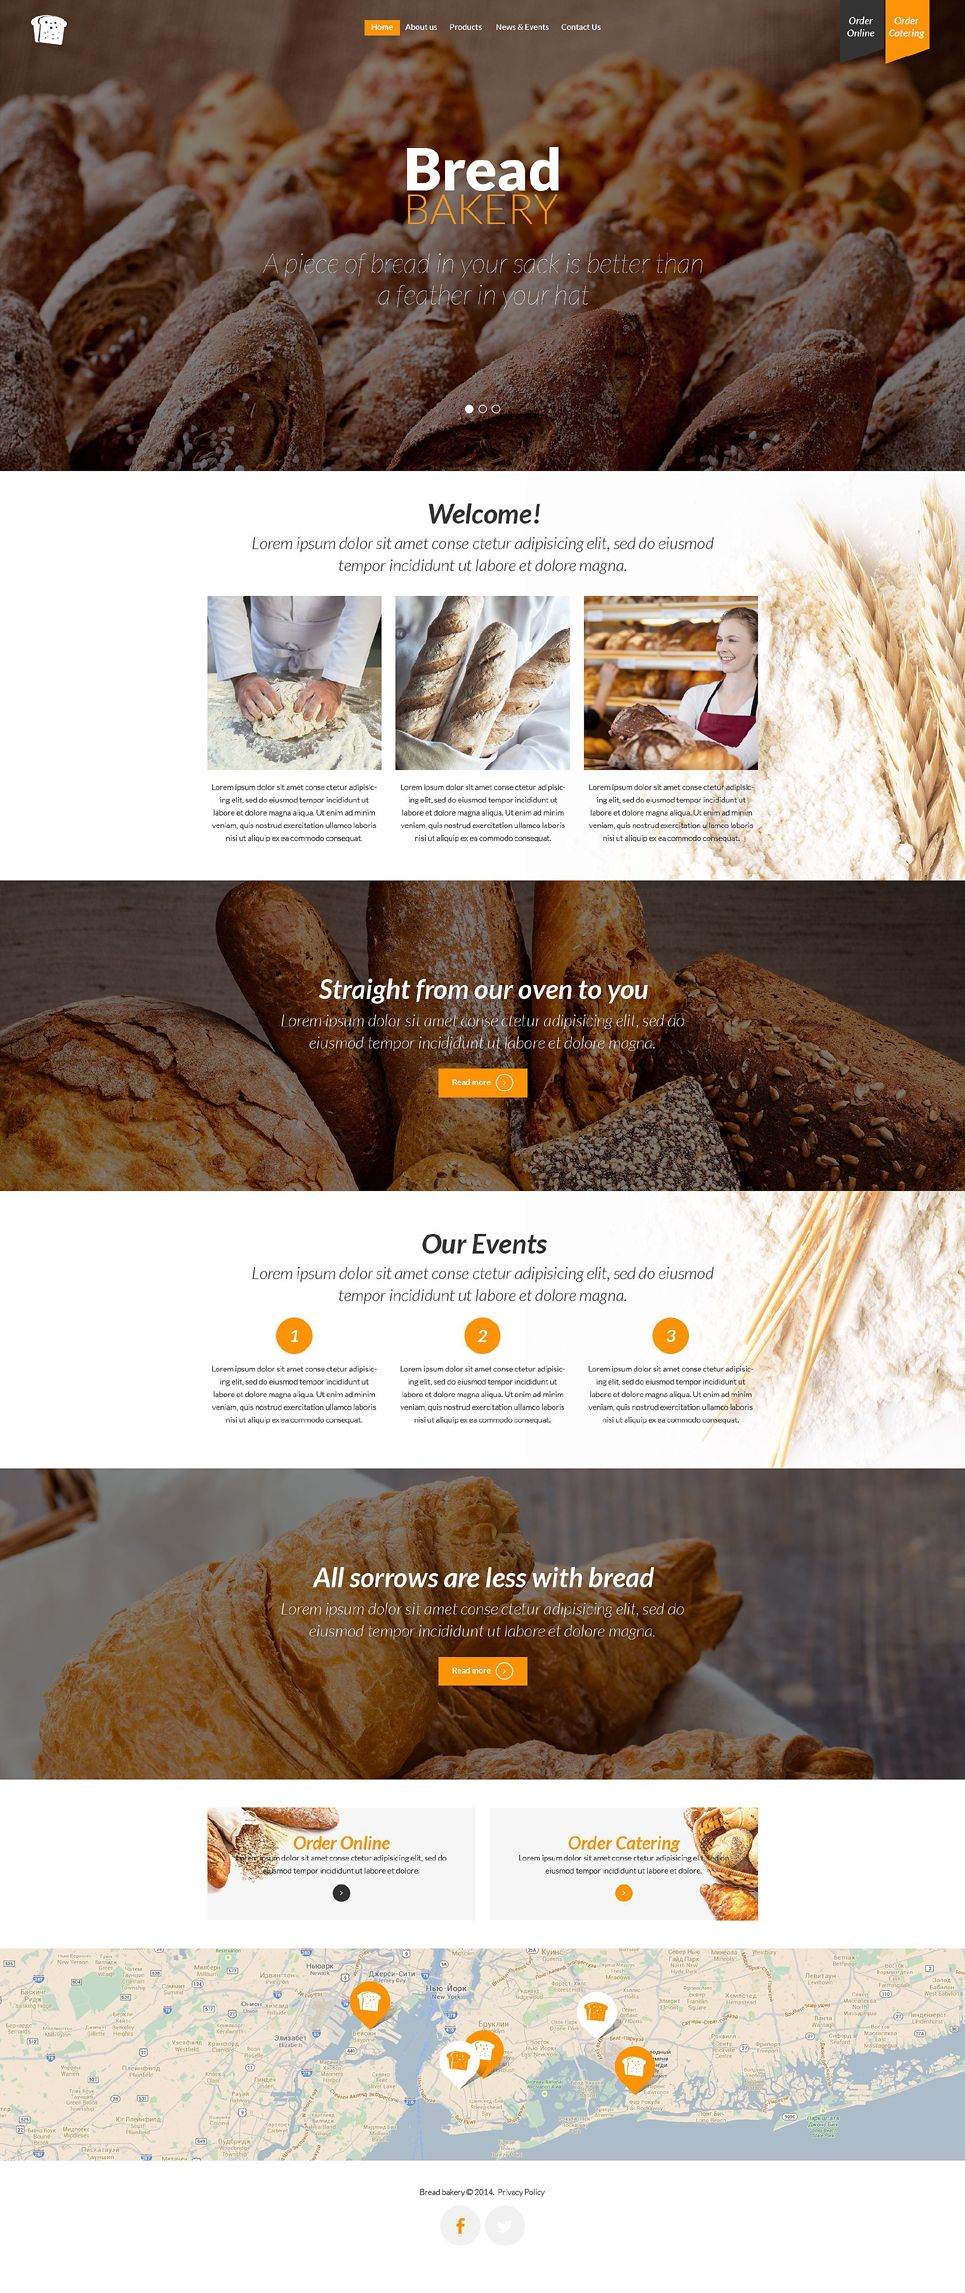 Bakery Responsive Website Template 52572 Bakery Website Bakery Food Web Design